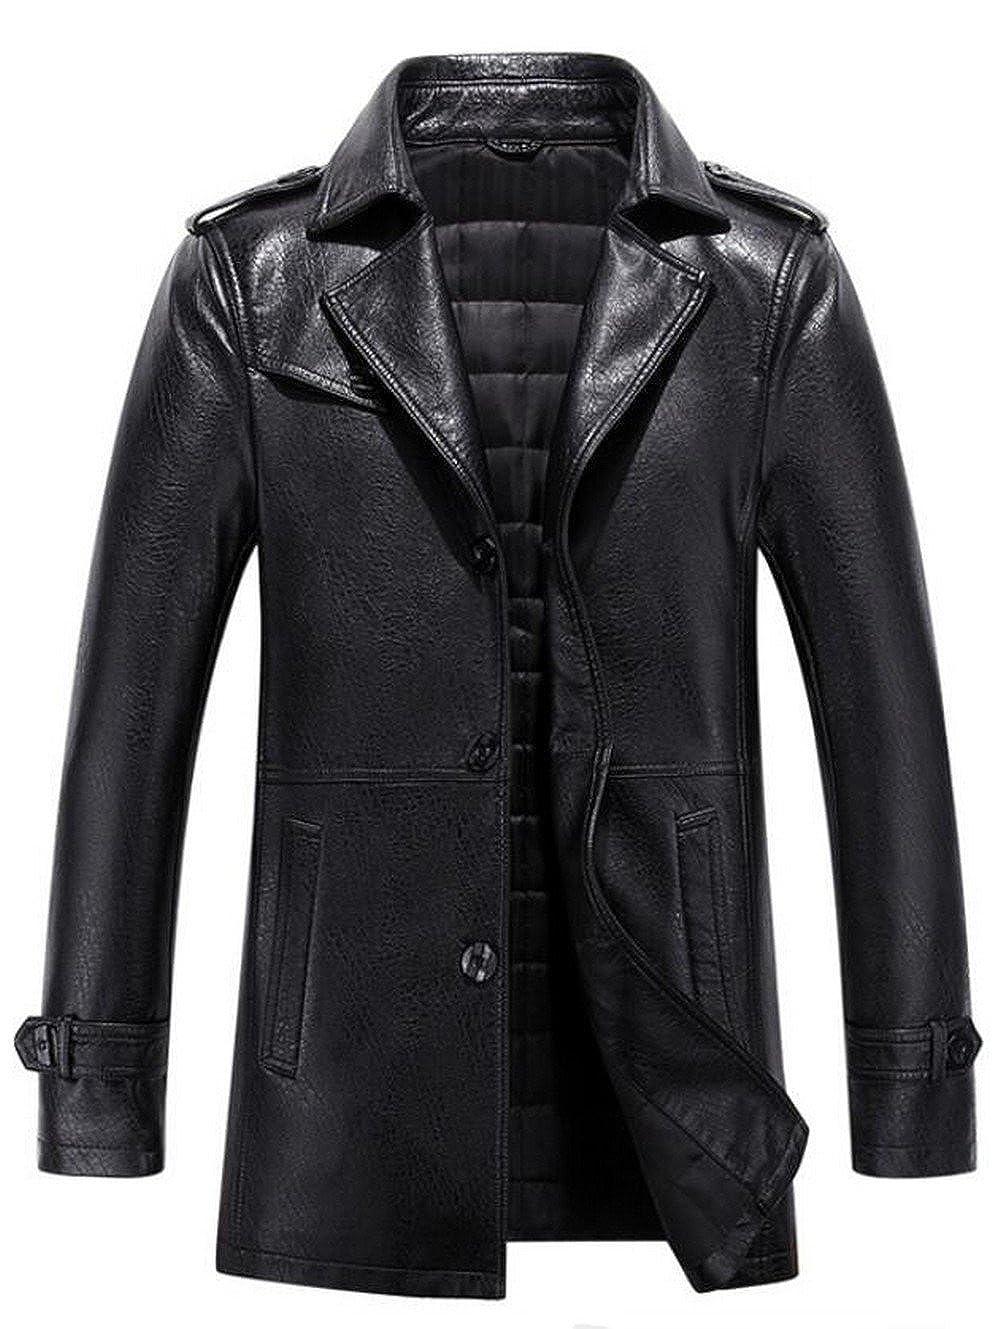 JIAX Men's New British Style Blazers MA-1 Faux Leather Bomber Jacket Coats